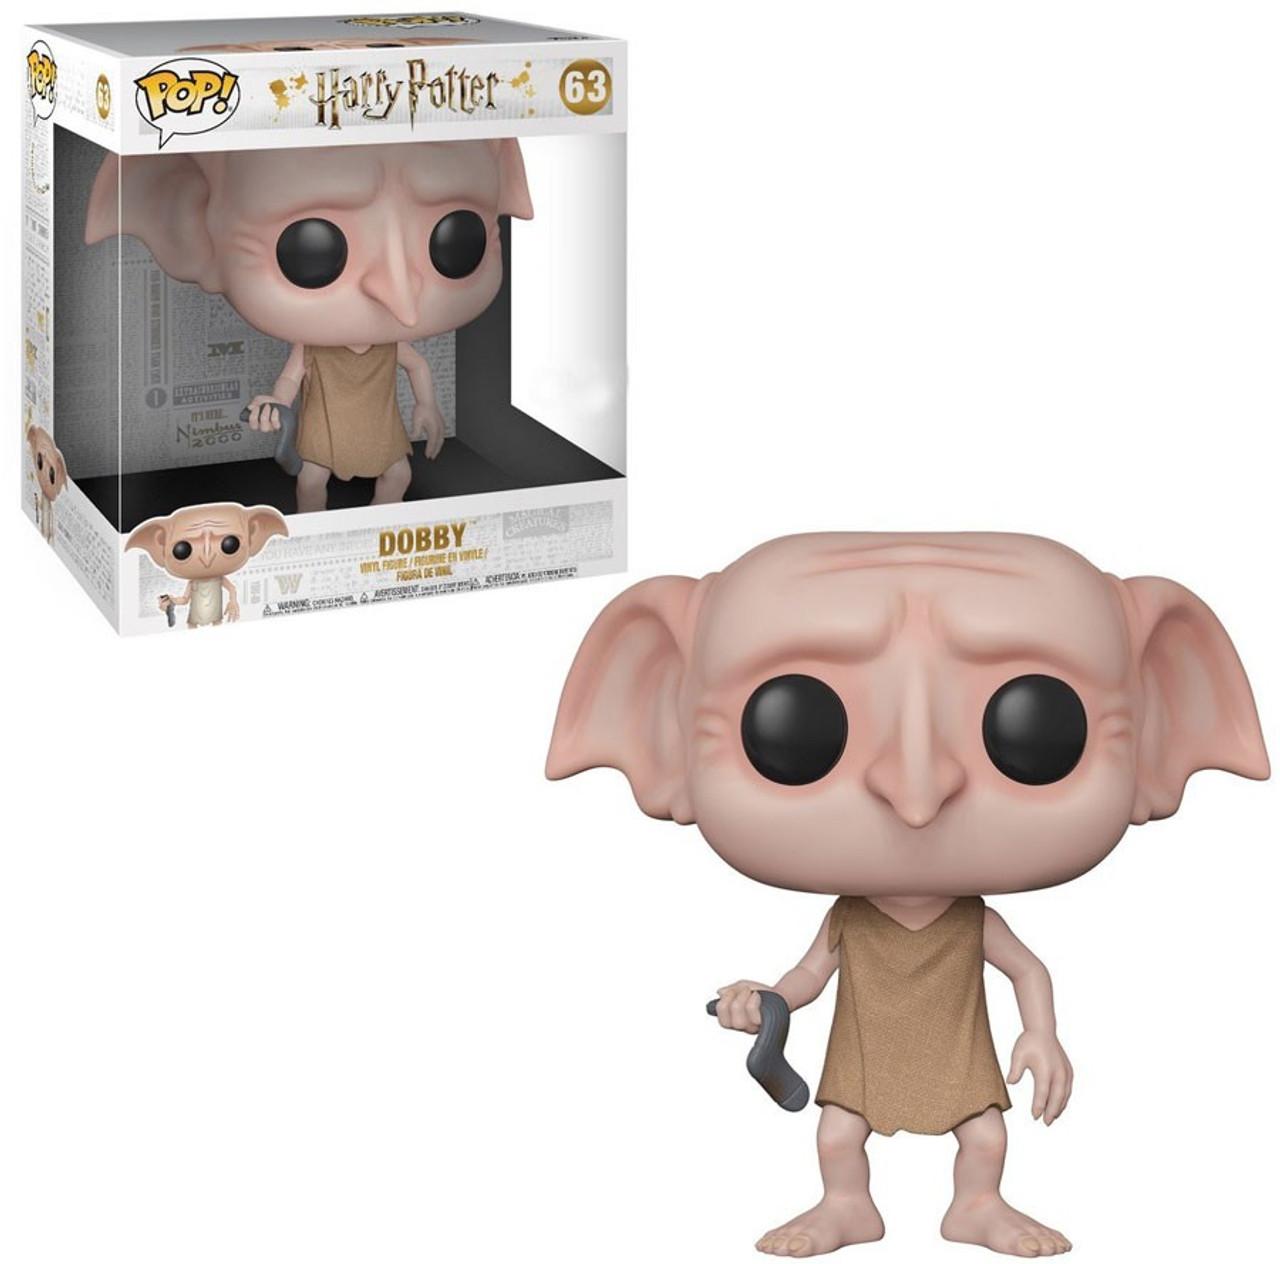 714aa2222b2 Funko Harry Potter Funko POP Movies Dobby Exclusive 10 Vinyl Figure 63  Super Size